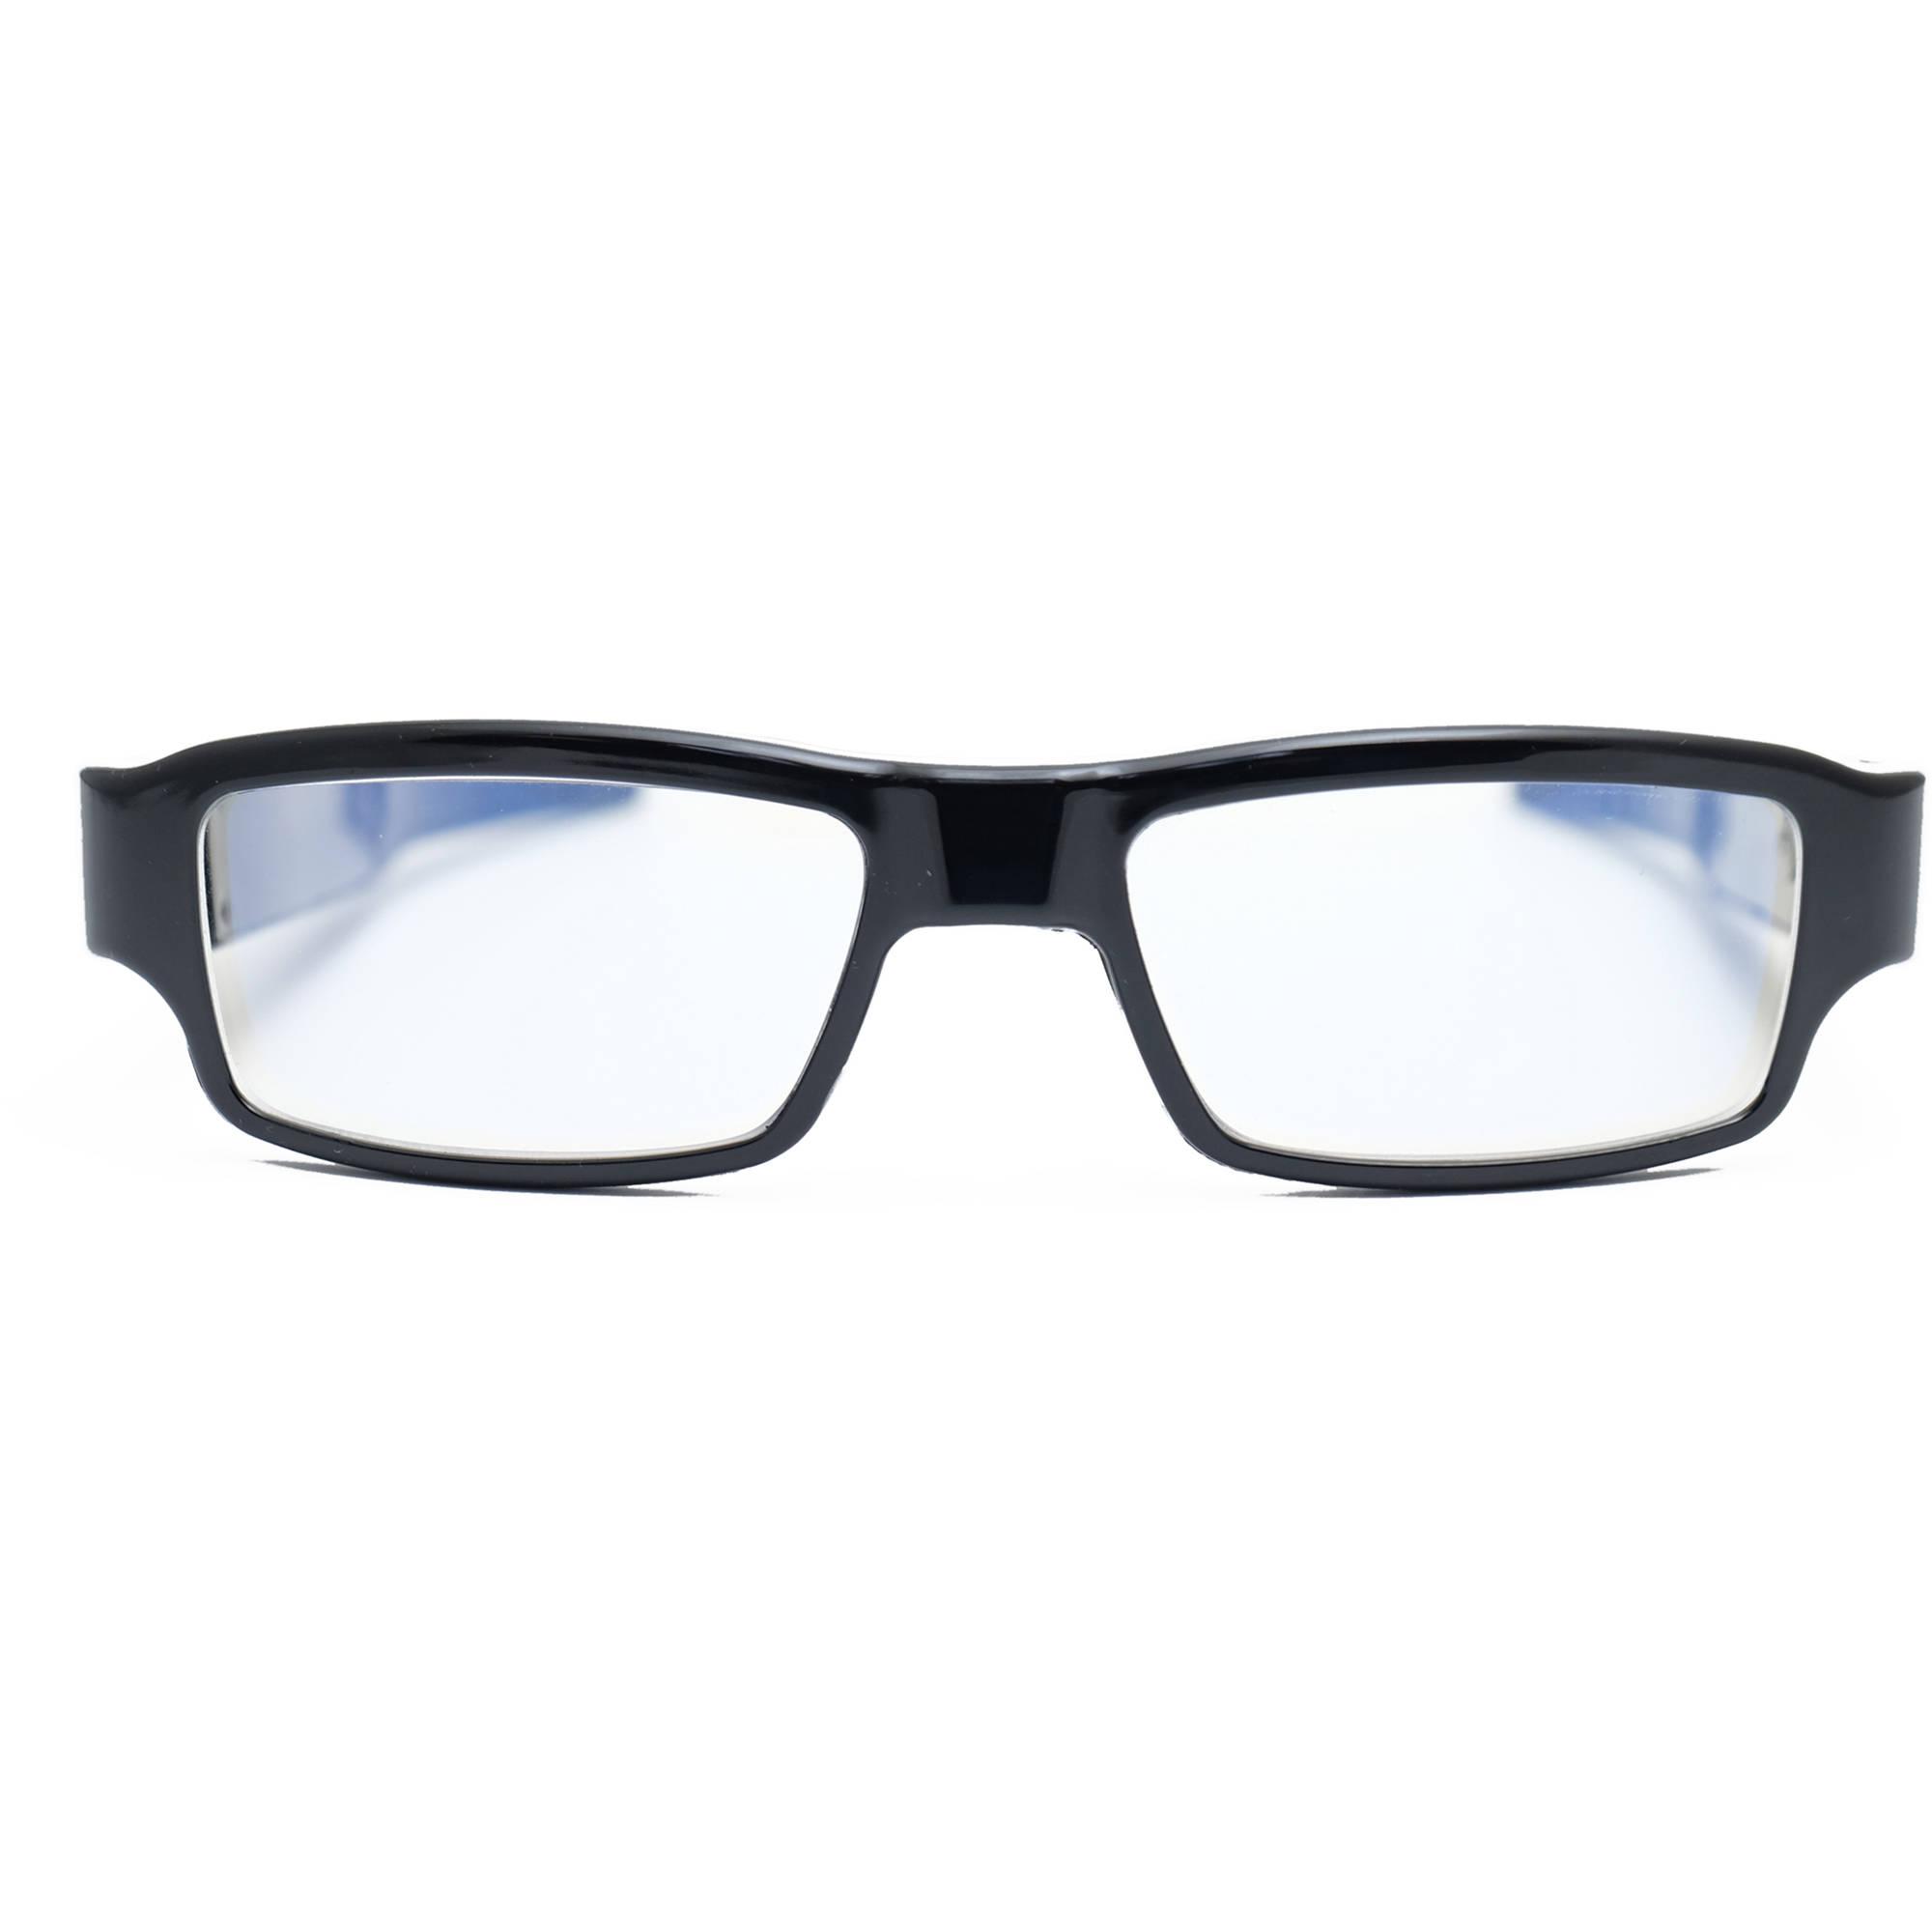 Mini Gadgets BST1080pGlasses Full-Frame Glasses BST1080PGLASSES